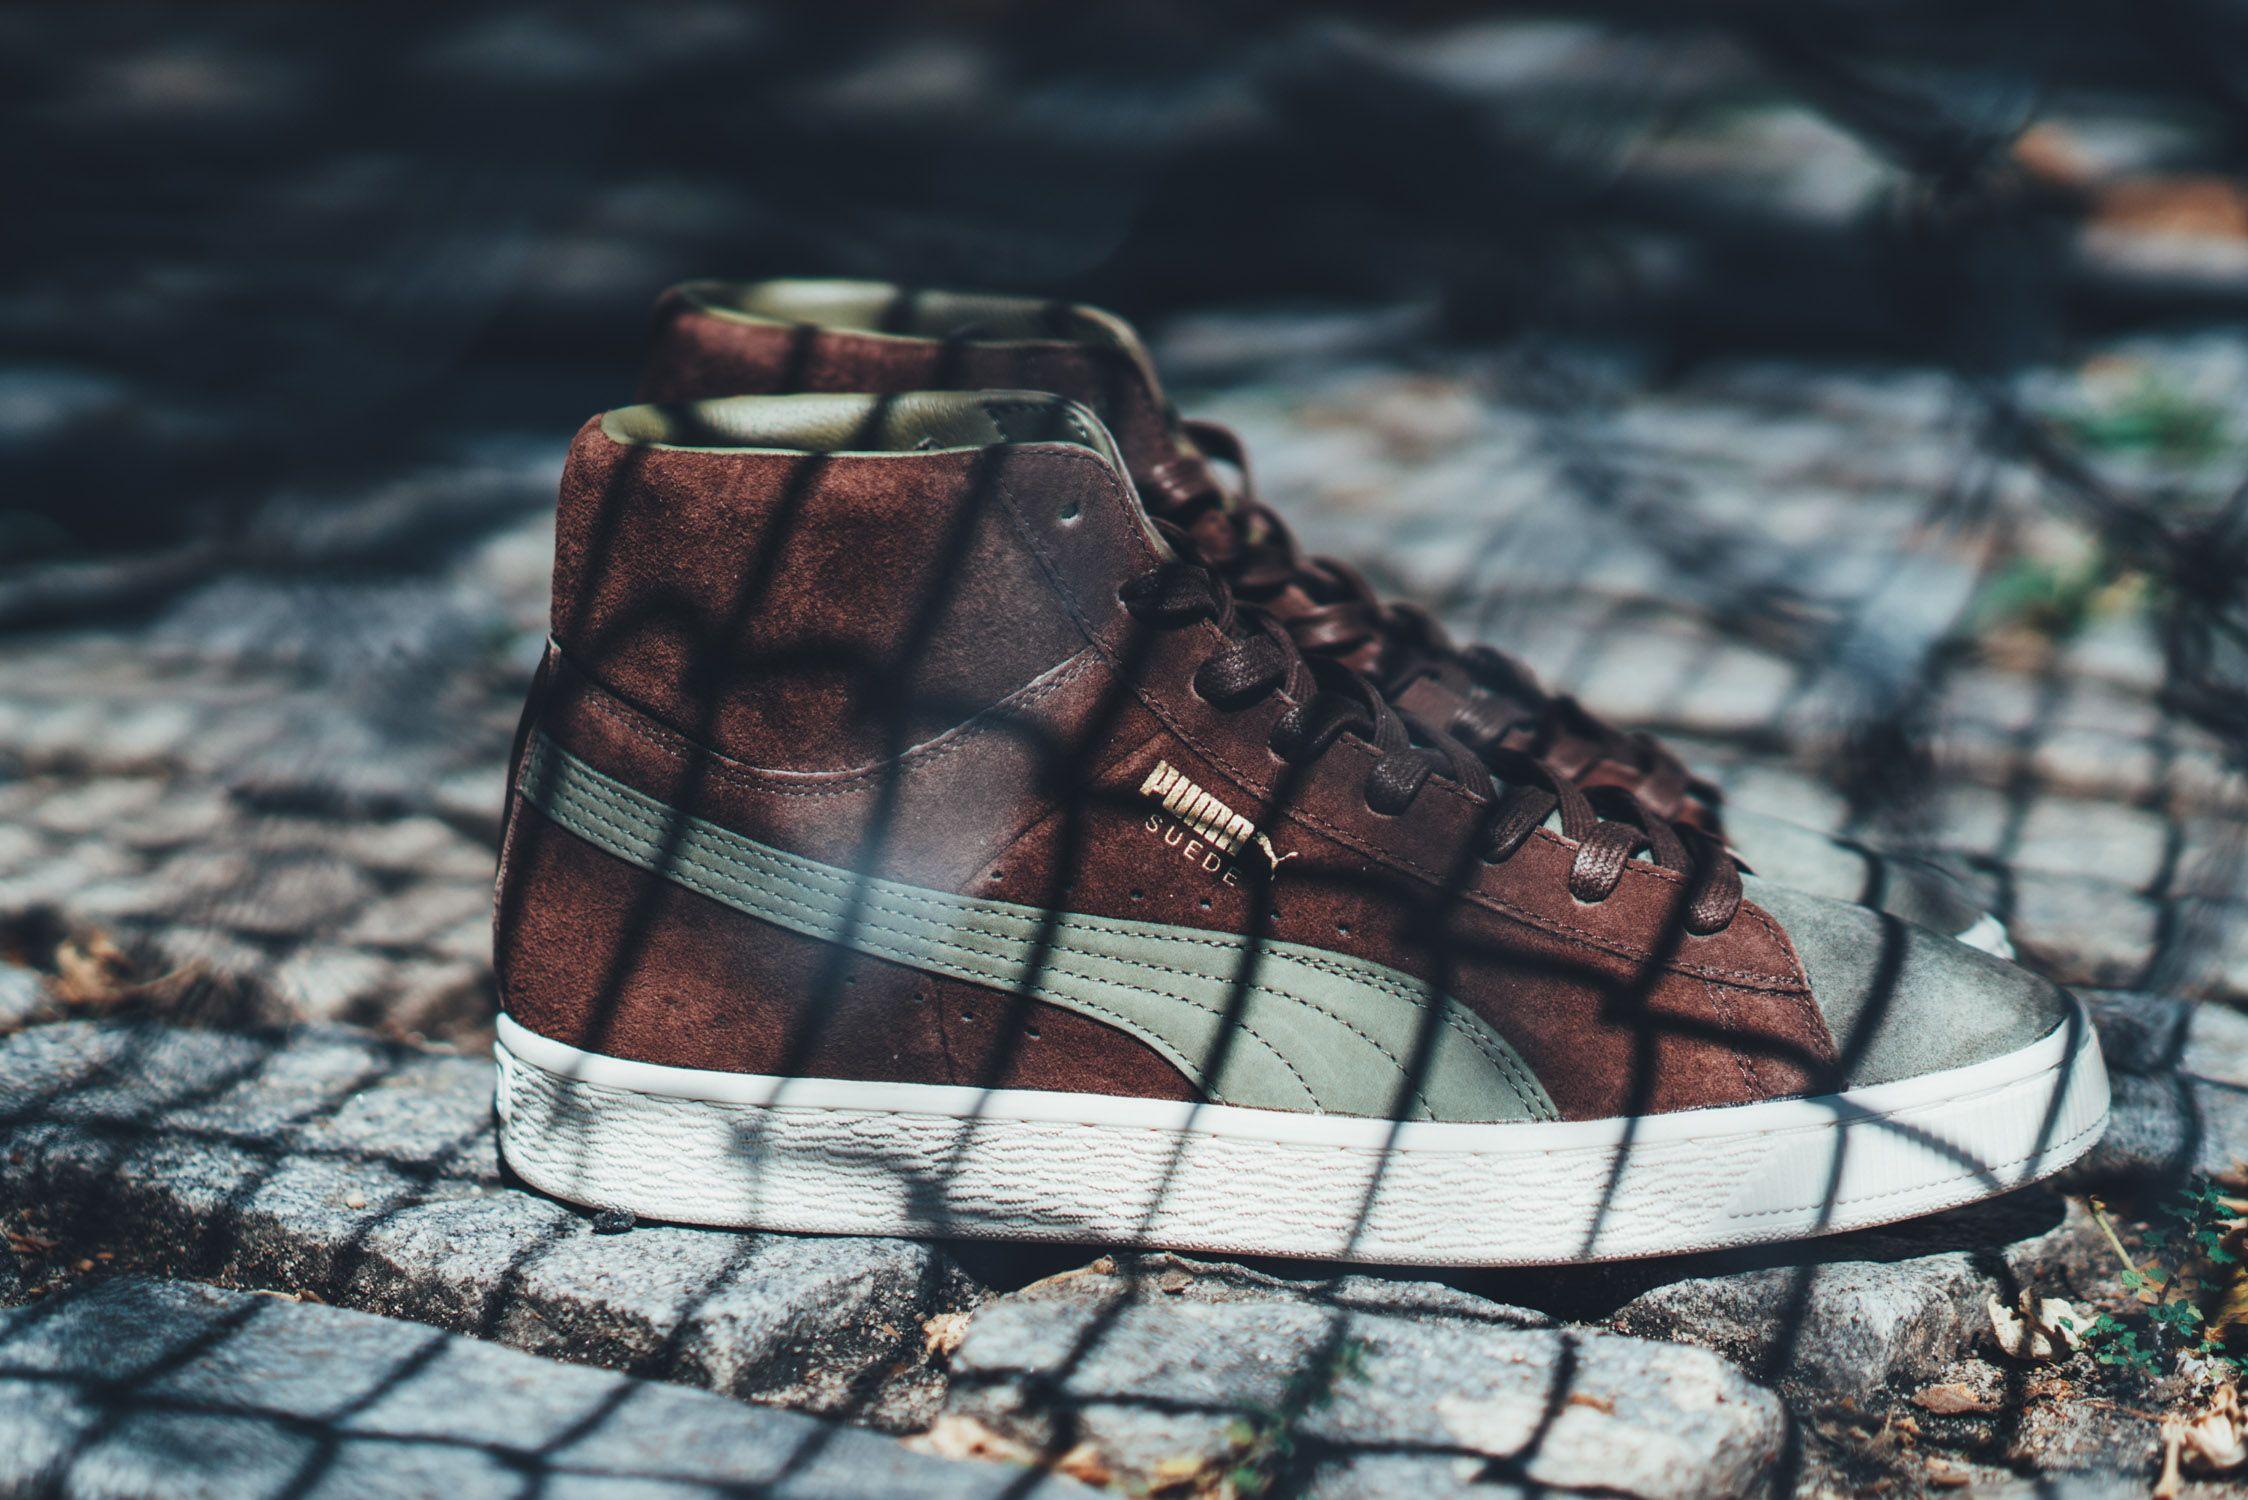 PUMA x BOBBITO,  #BOBBITO #PUMA #sneaker, #agpos, #sneaker, #sneakers, #sneakerhead, #solecollector, #sneakerfreaker,  #nicekicks, #kicks, #kotd, #kicks4eva #kicks0l0gy, #kicksonfire, #womft, #walklikeus, #schuhe, #turnschuhe, #yeezy, #nike, #adidas, #puma, #asics, #newbalance #jordan, #airjordan, #kicks